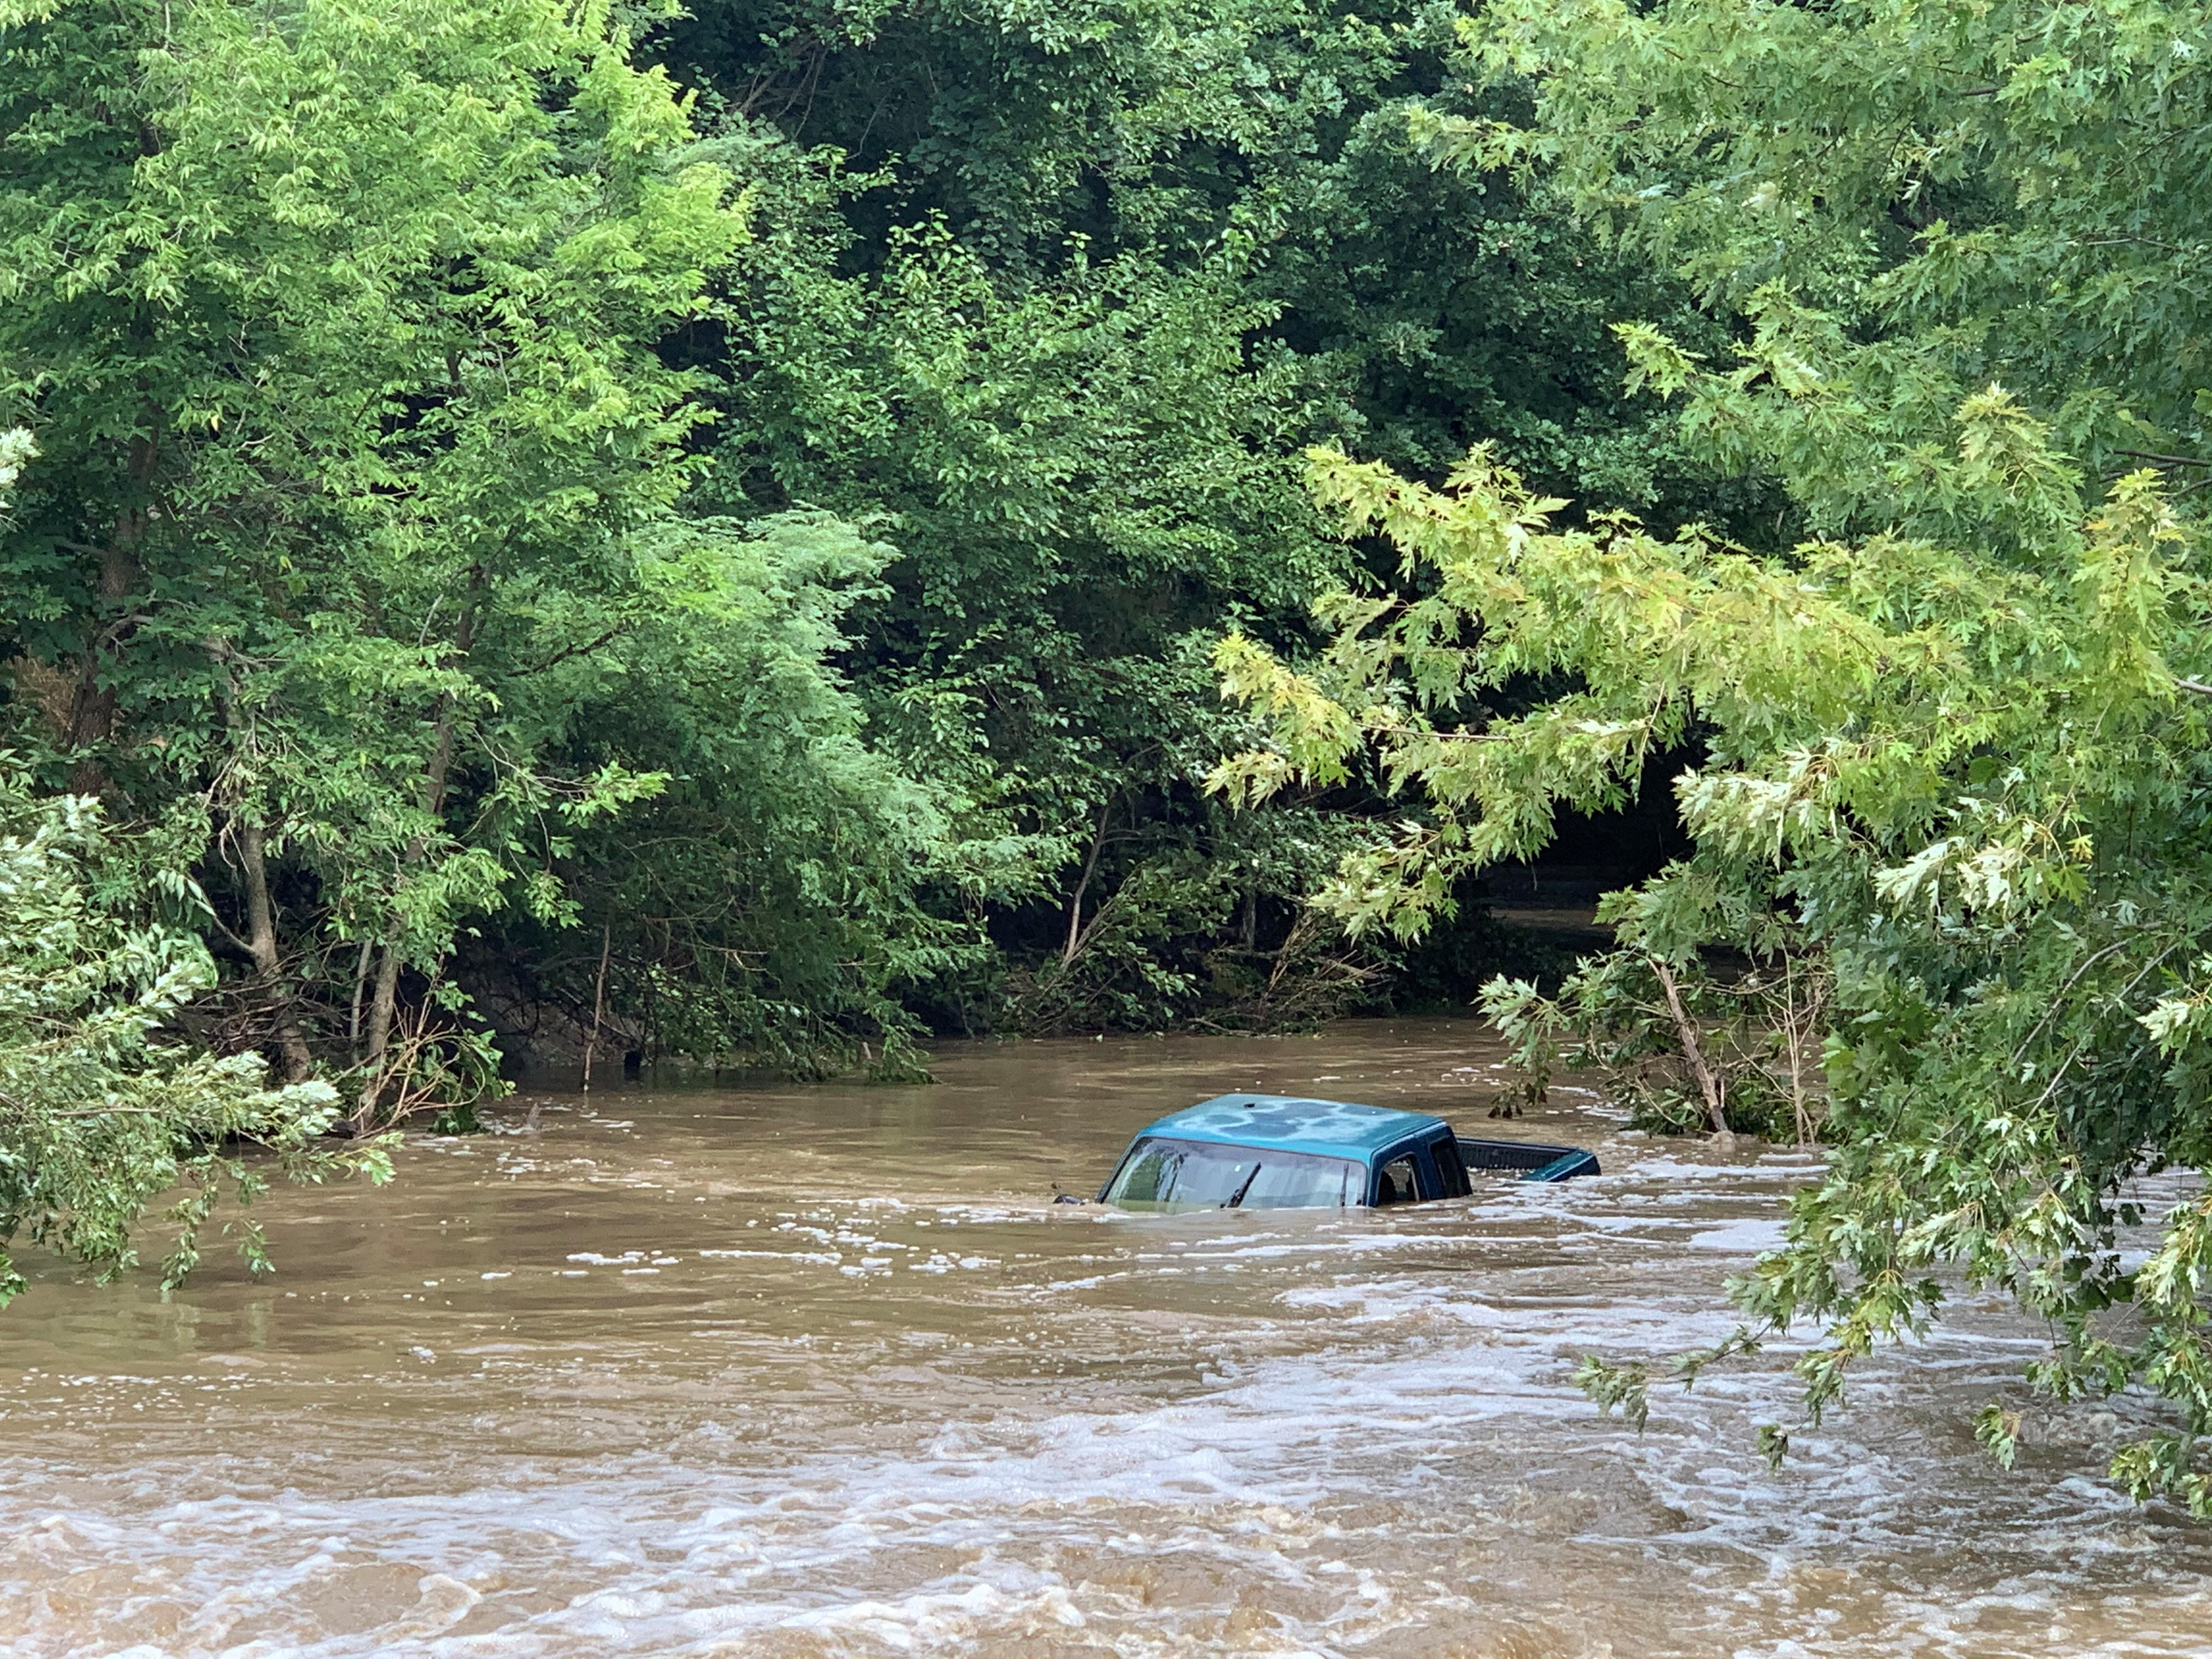 Truck submerged under water in Jefferson County